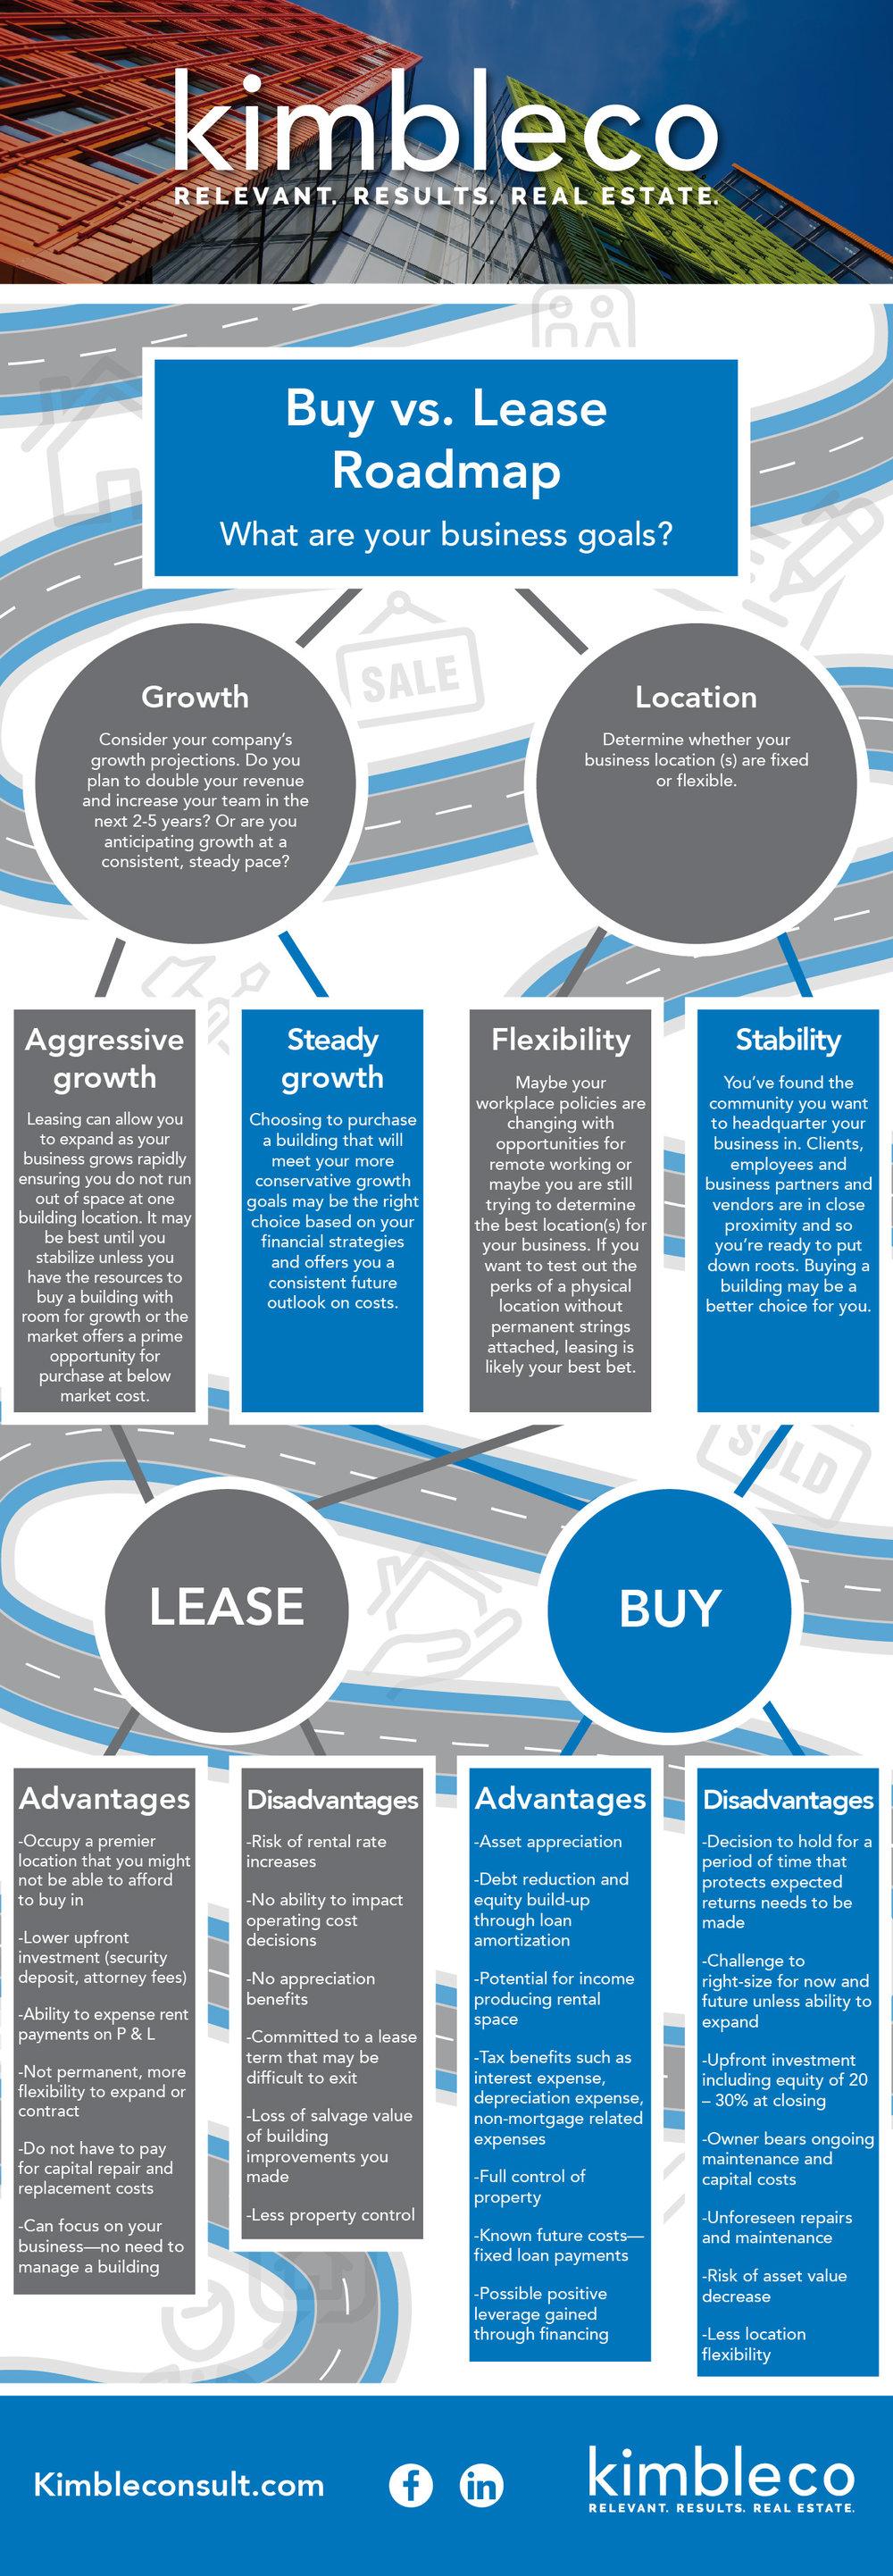 Buy vs Lease Infographic_Final-01.jpg